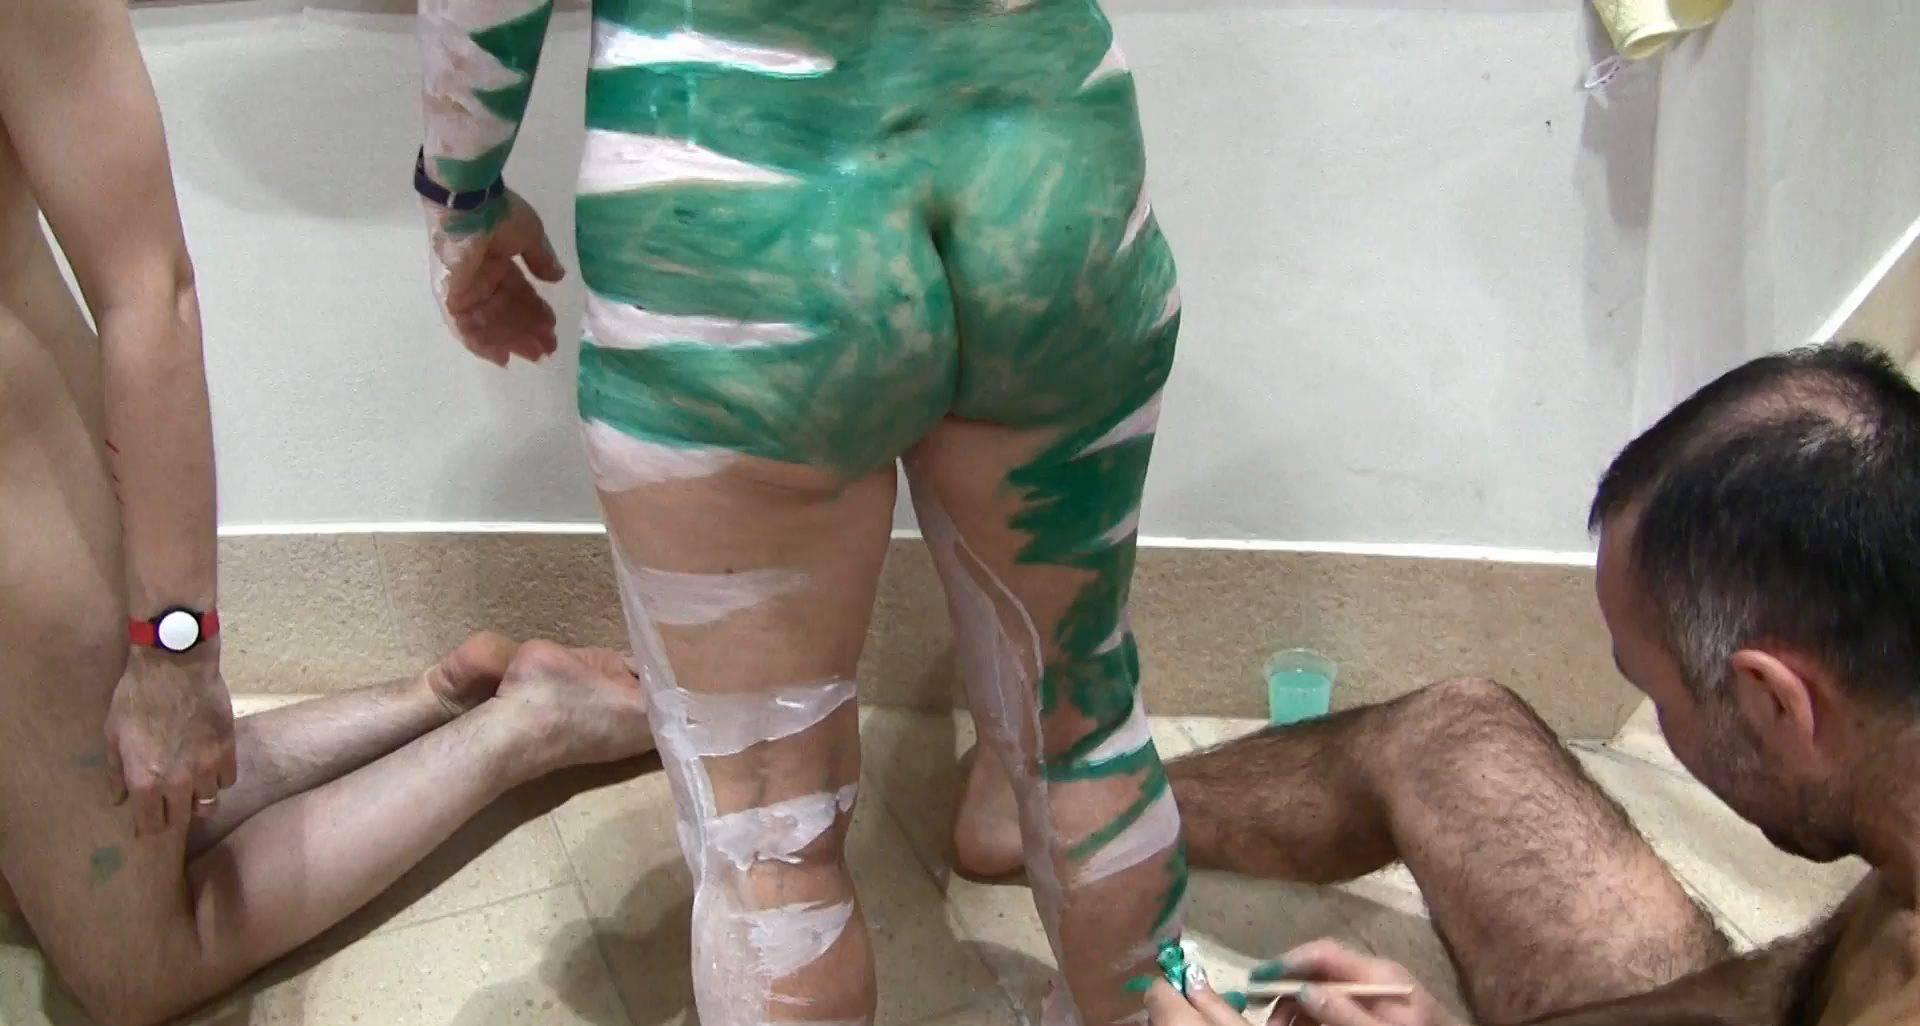 Nudist Videos Escaping the Hot Sun 1 - 2